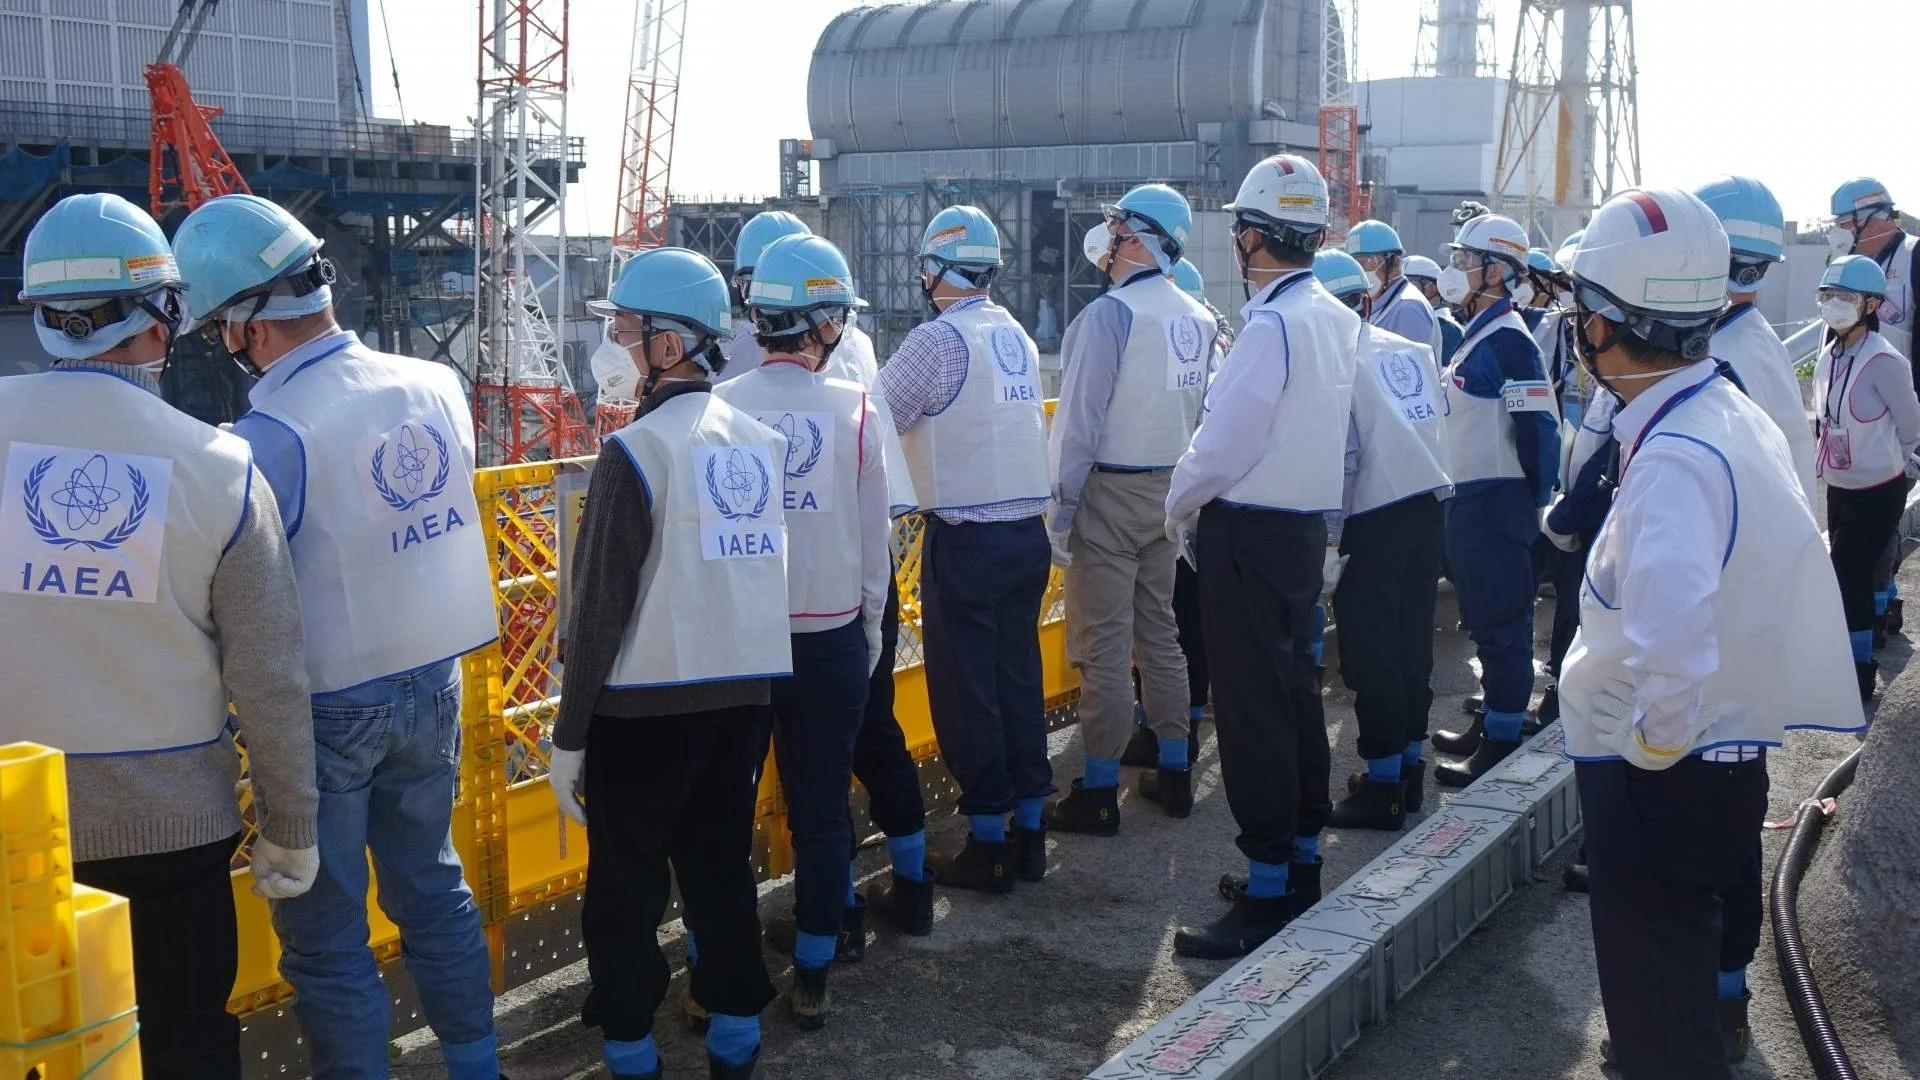 IAEA-Mission-Nov-18-Fukushima-Daiichi-1.jpg